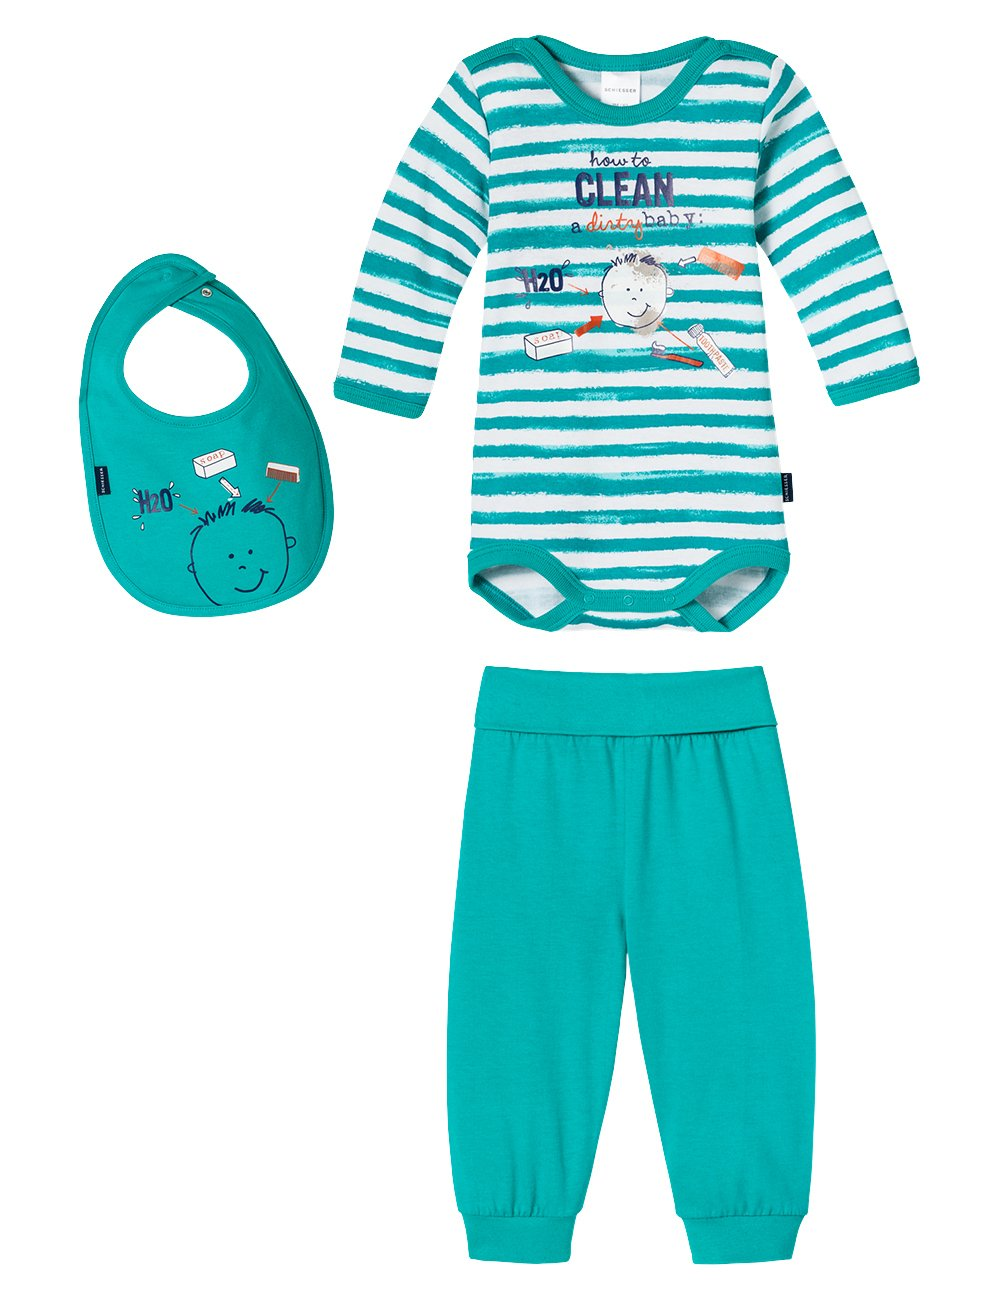 Schiesser Baby Boys Baby Set Jungs Lingerie Set Schiesser AG 146199